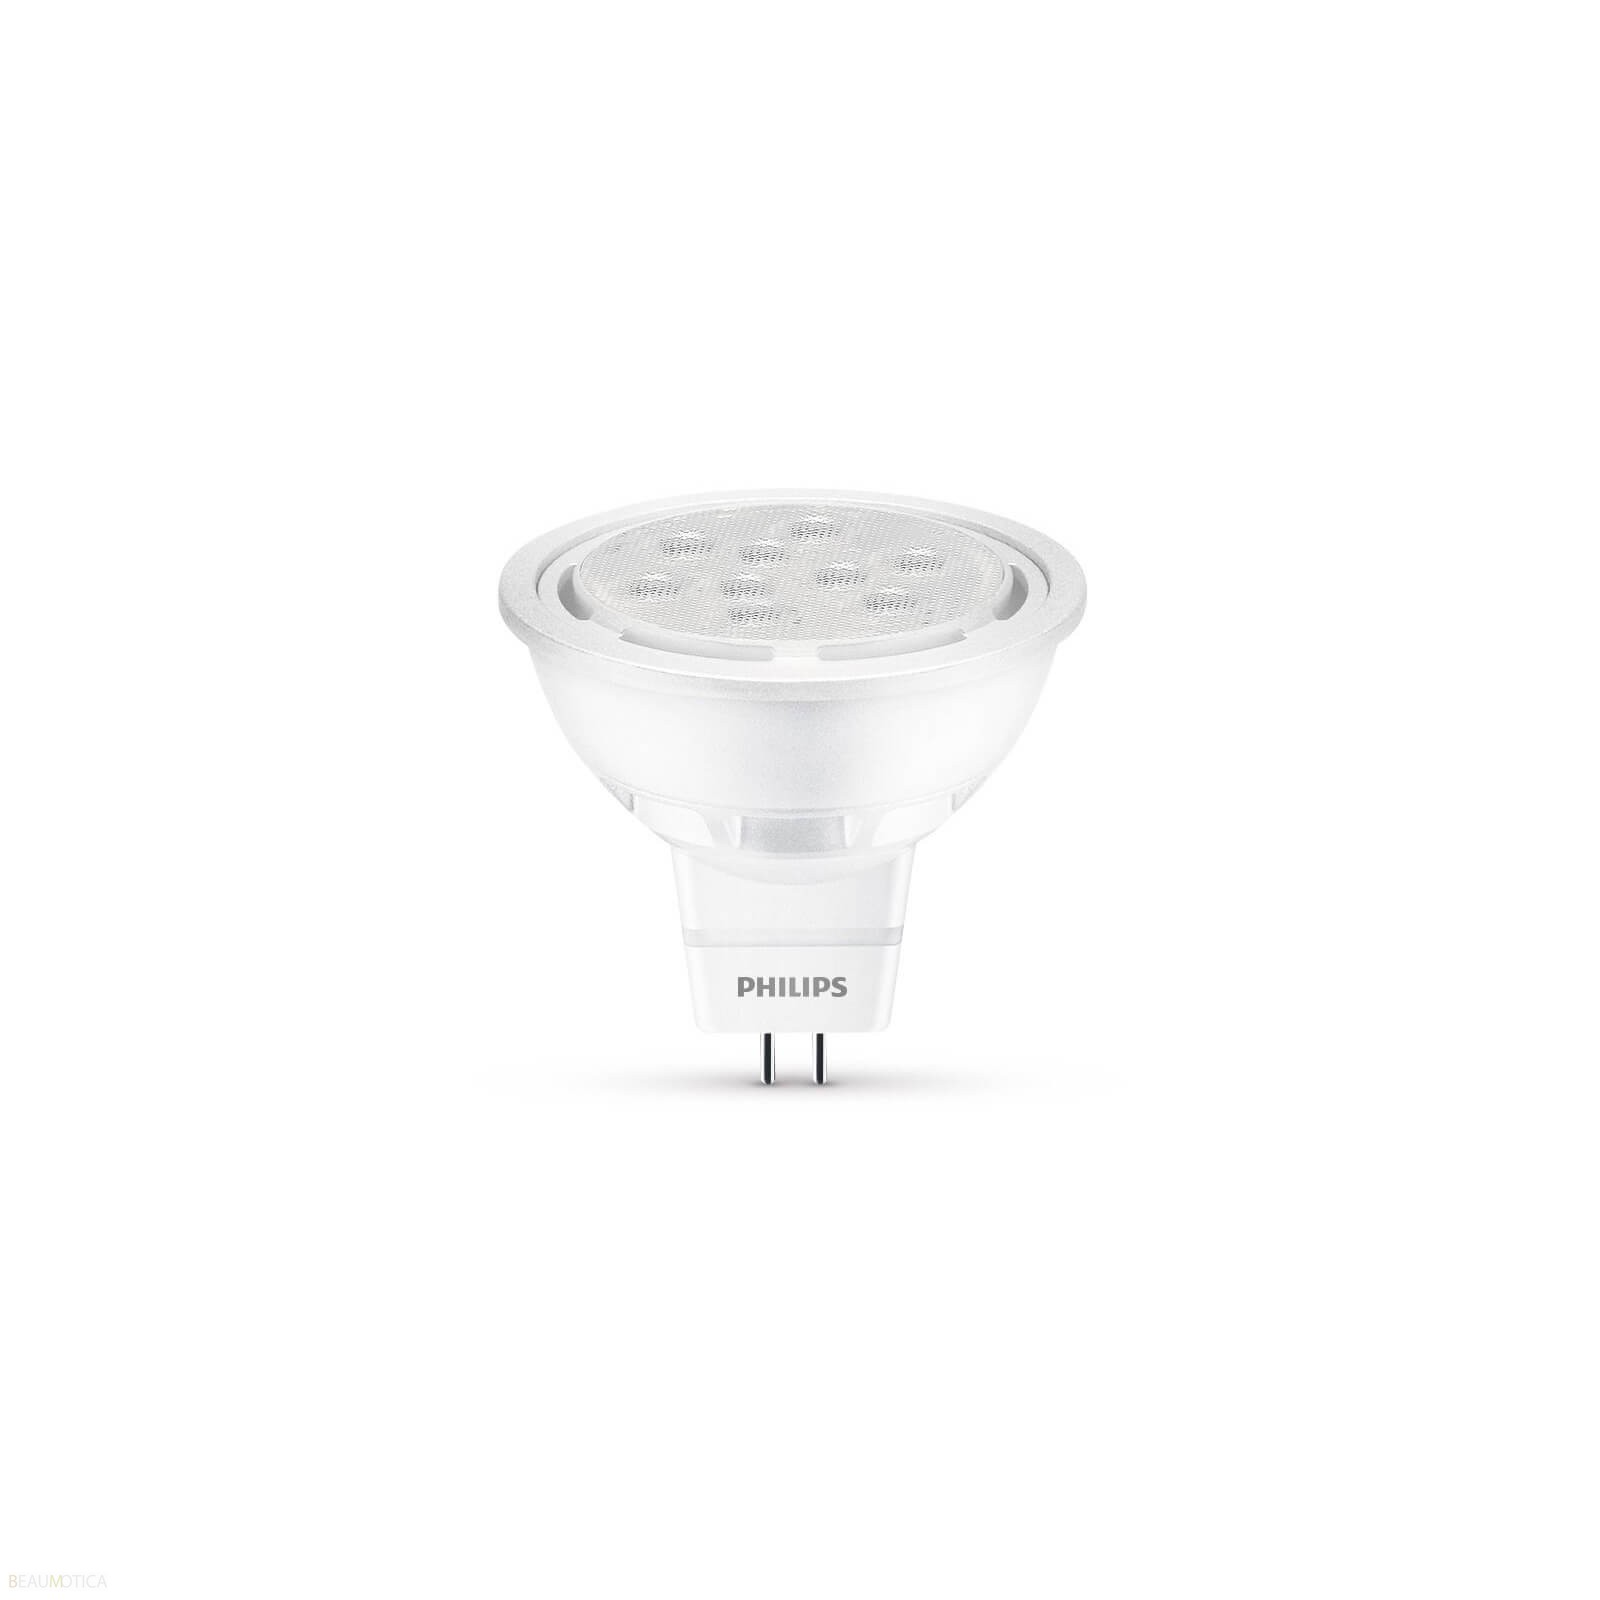 philips-led-bulbs-gu5-3-8718696579350-20241759_160 Schöne Philips Led Gu5 3 Dekorationen